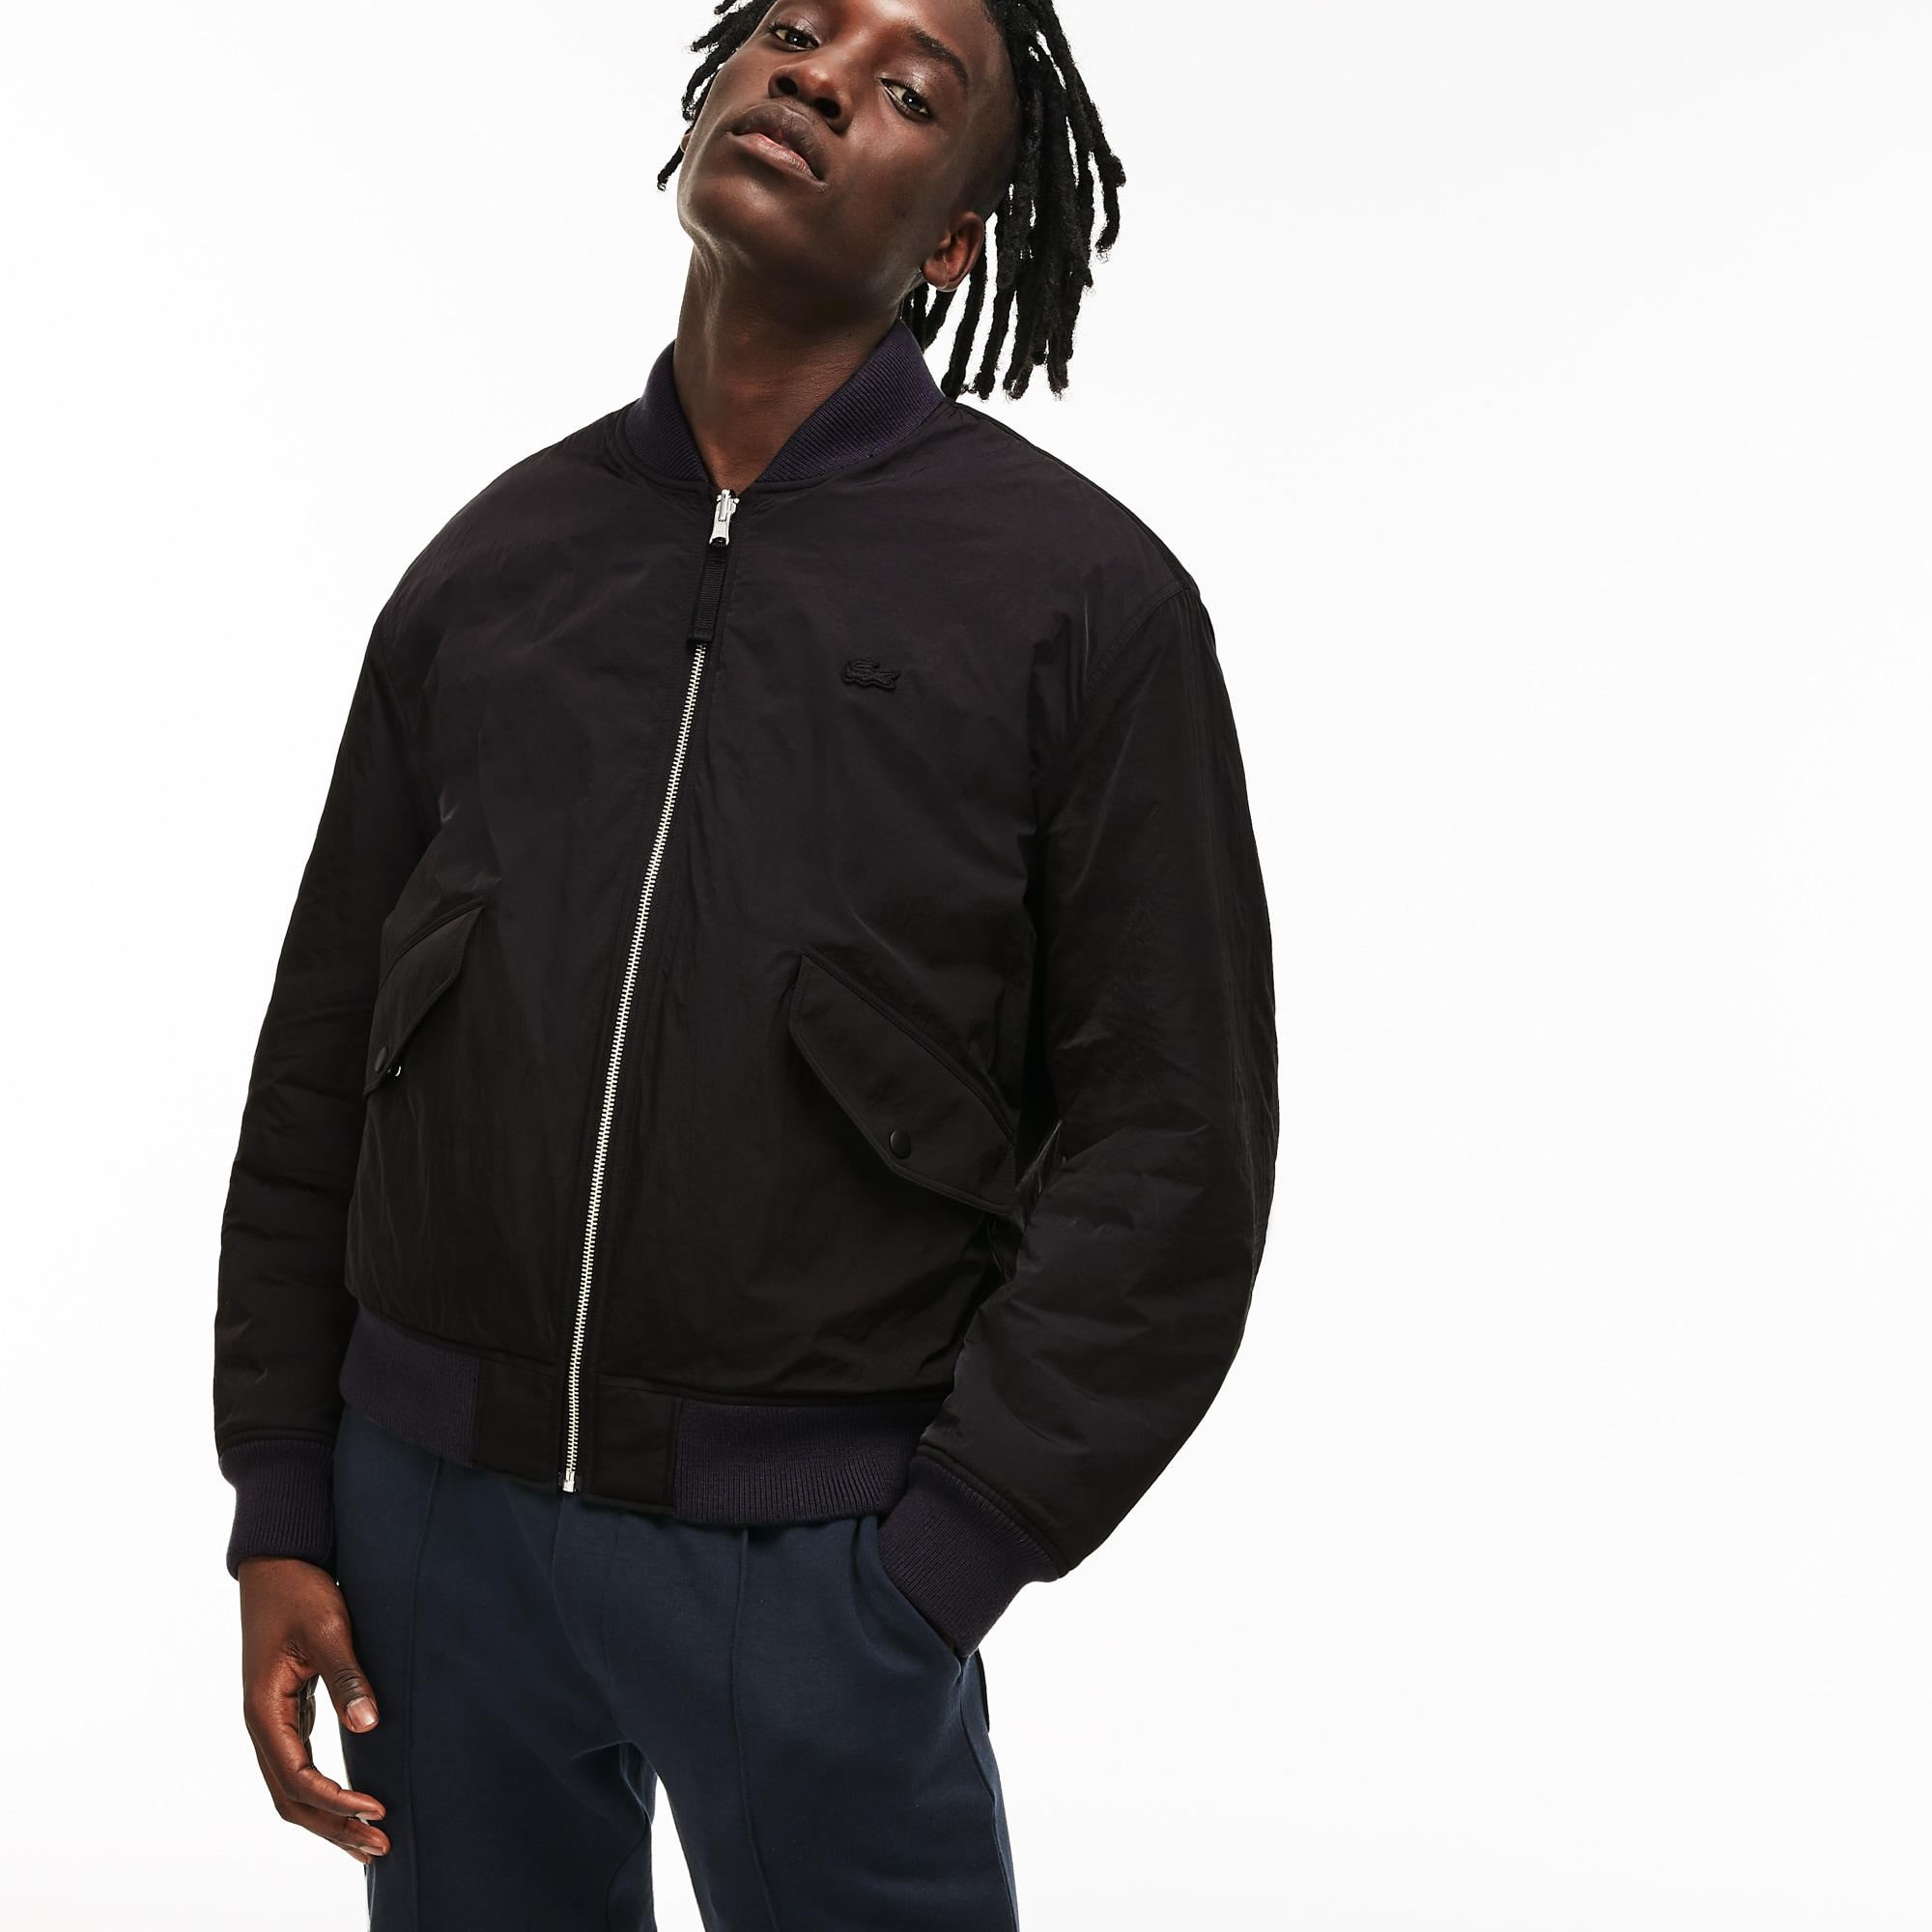 Unisex LIVE Reversible Nylon And Fleece Bomber Jacket